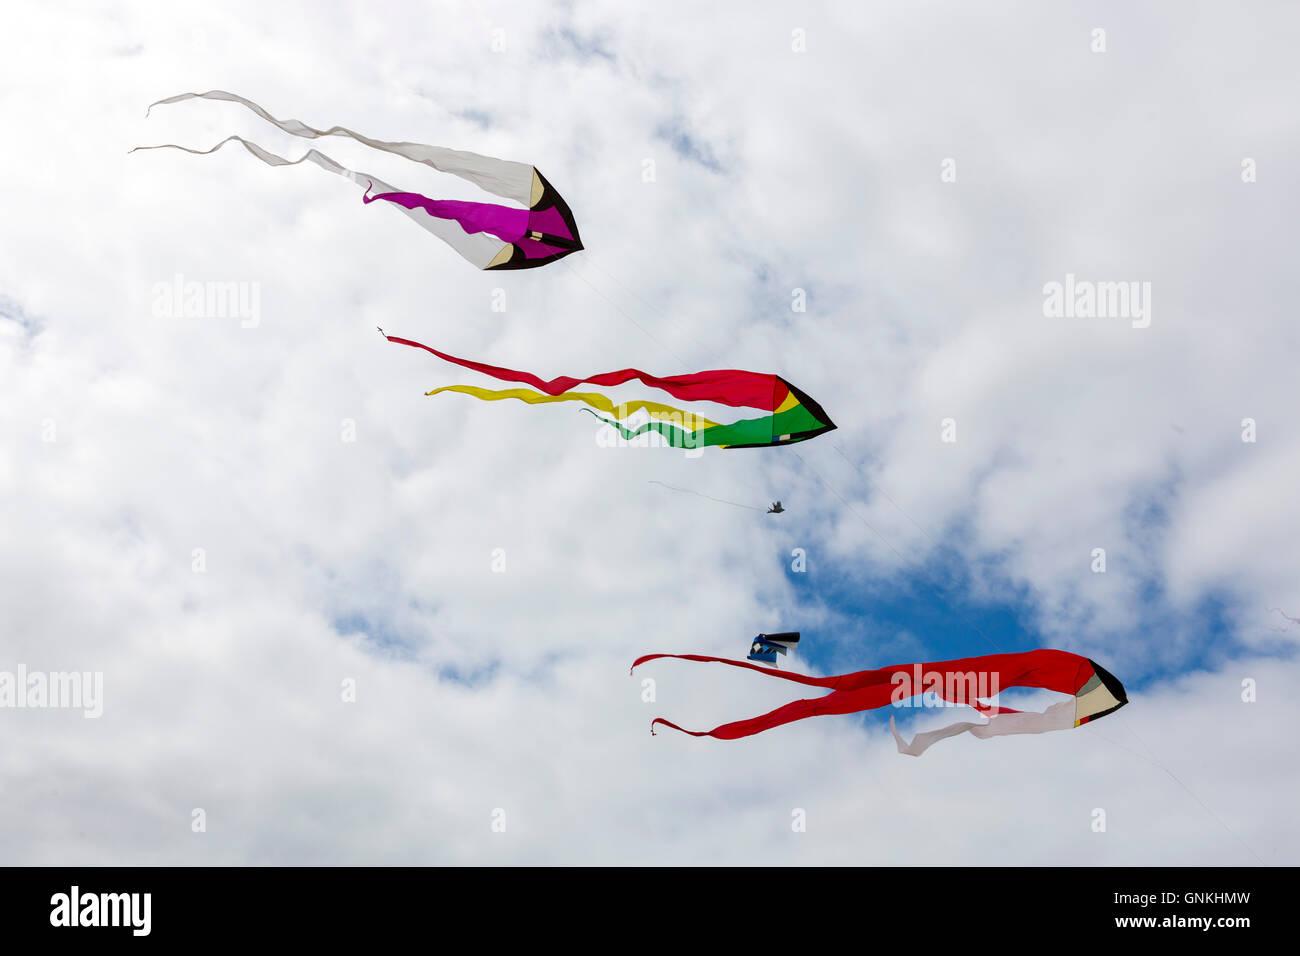 Kite festival of bright color kites in the sky above Fano Island - Fanoe - South Jutland, Denmark - Stock Image